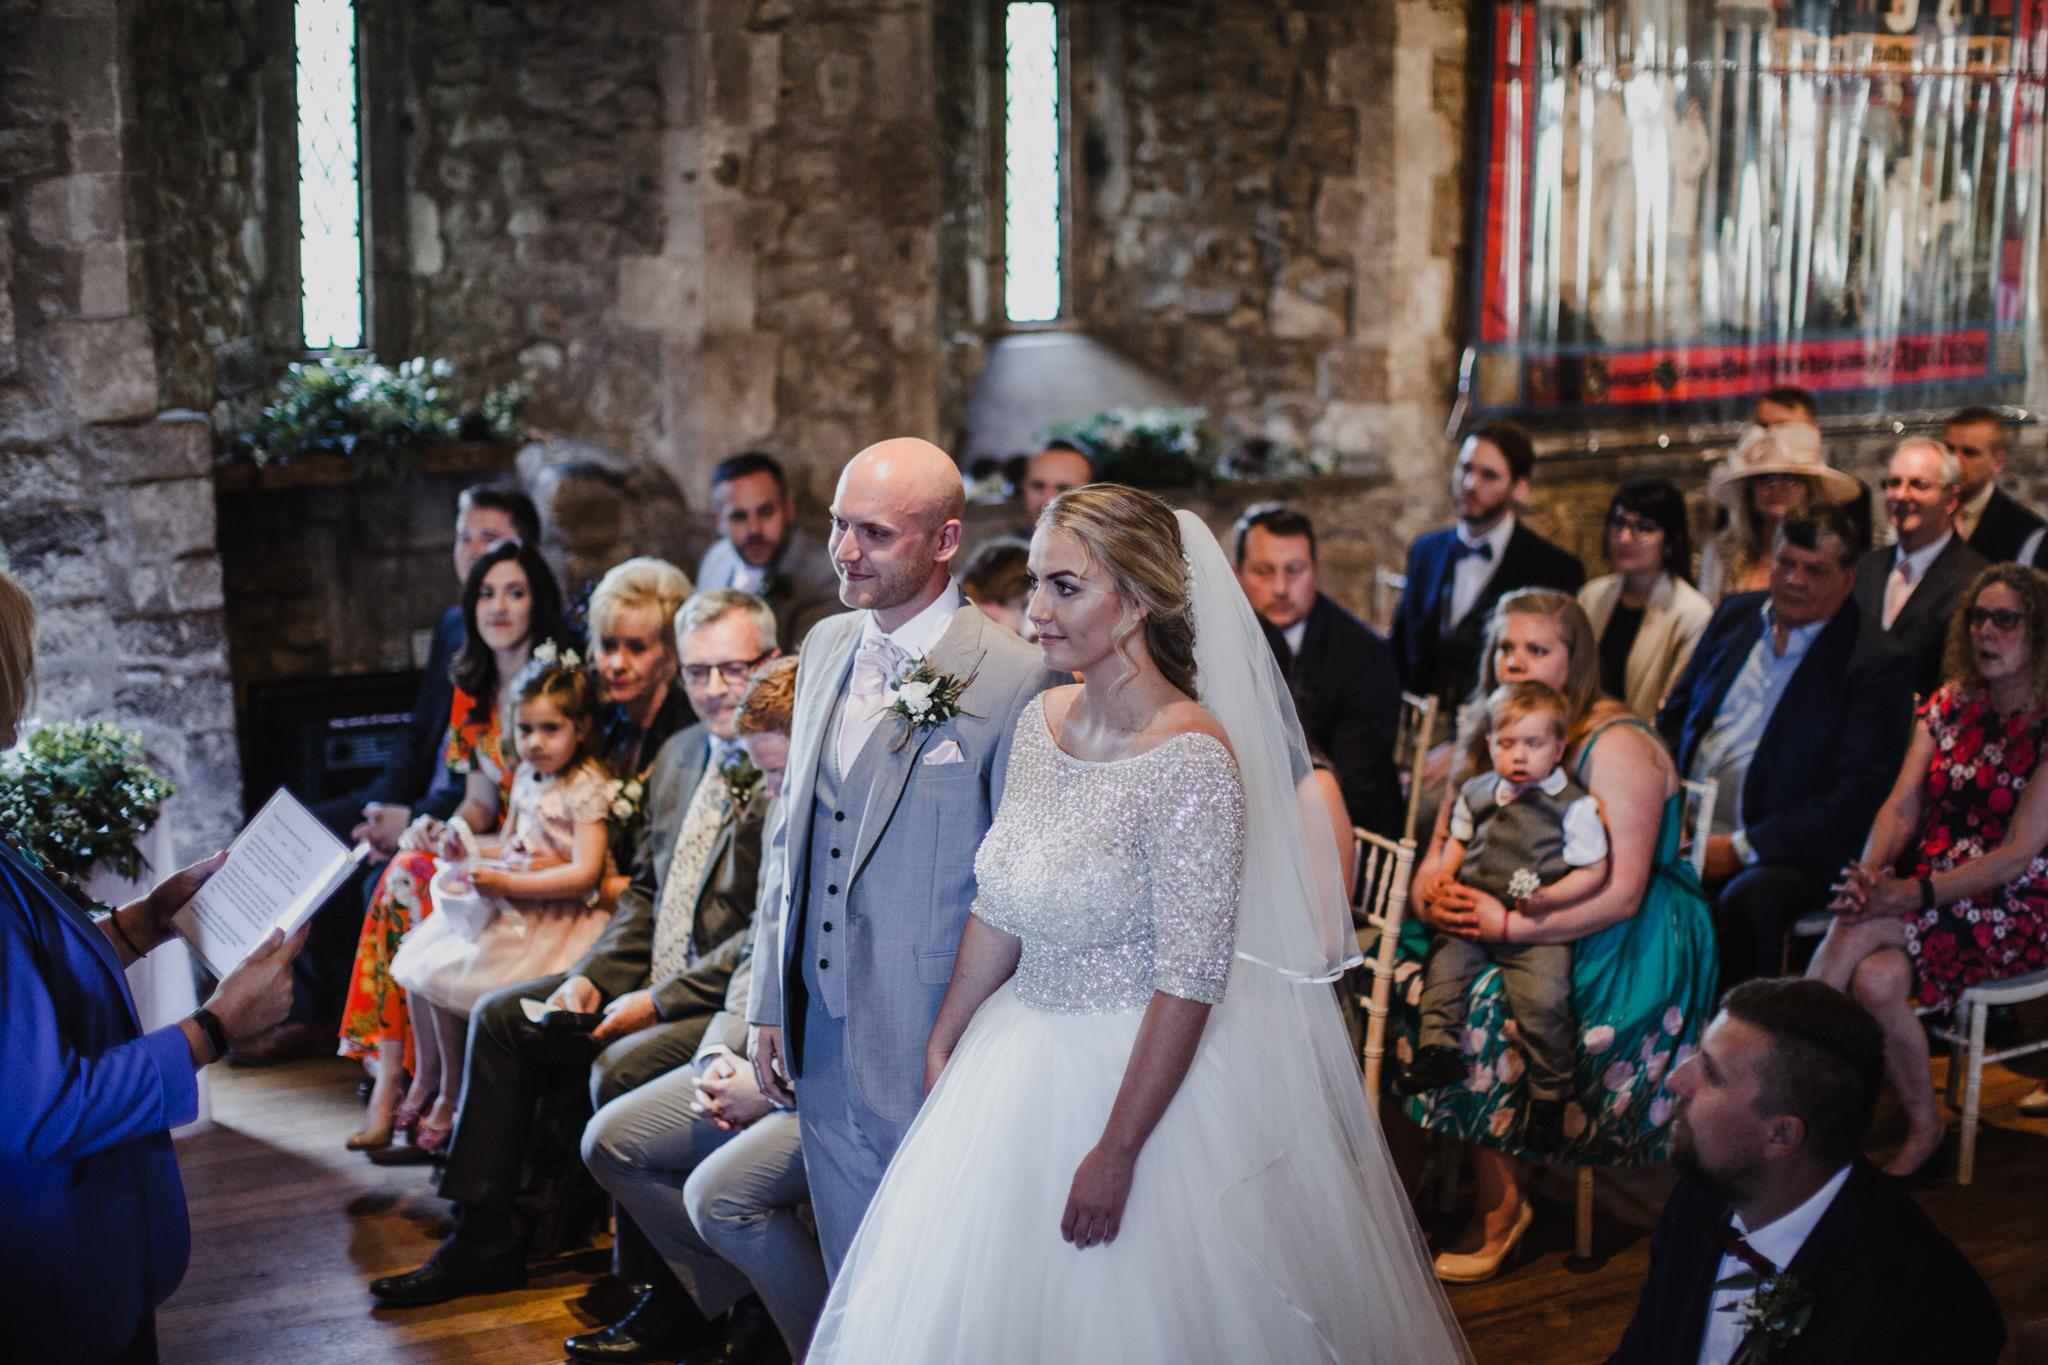 Bride and groom getting married in tudor style wedding venue